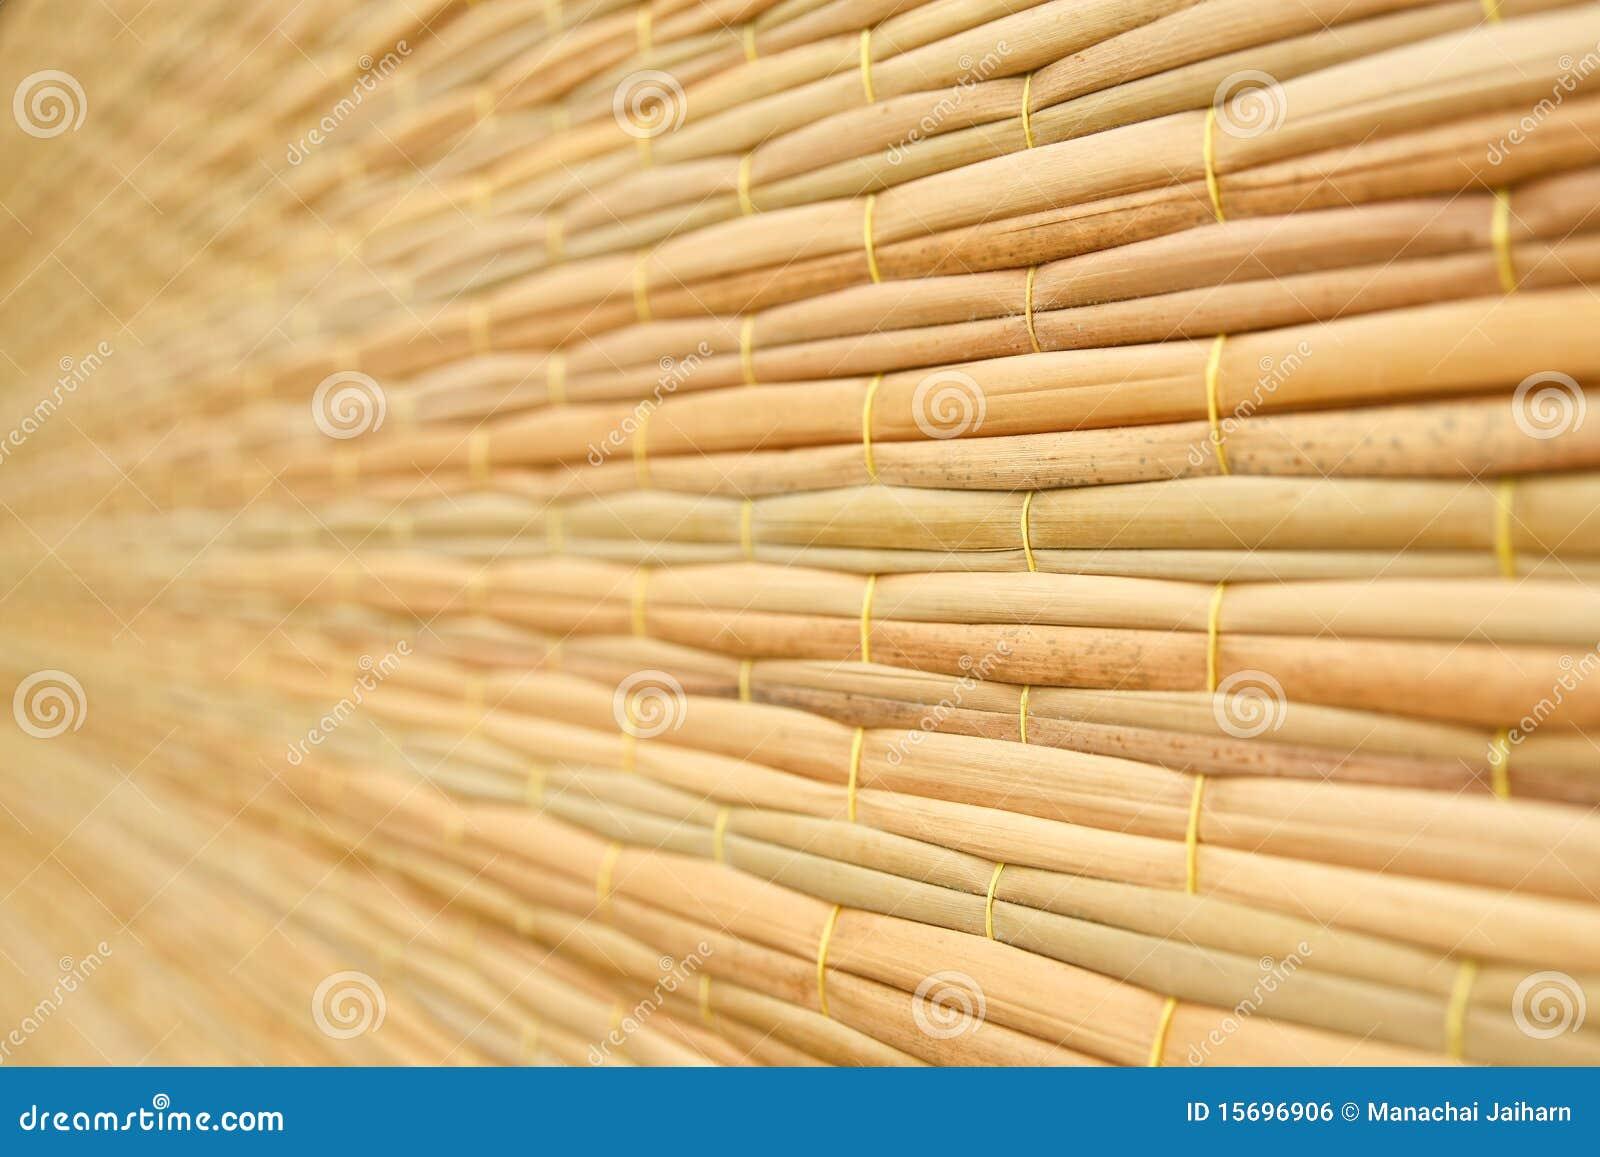 weave reed pattern - photo #6